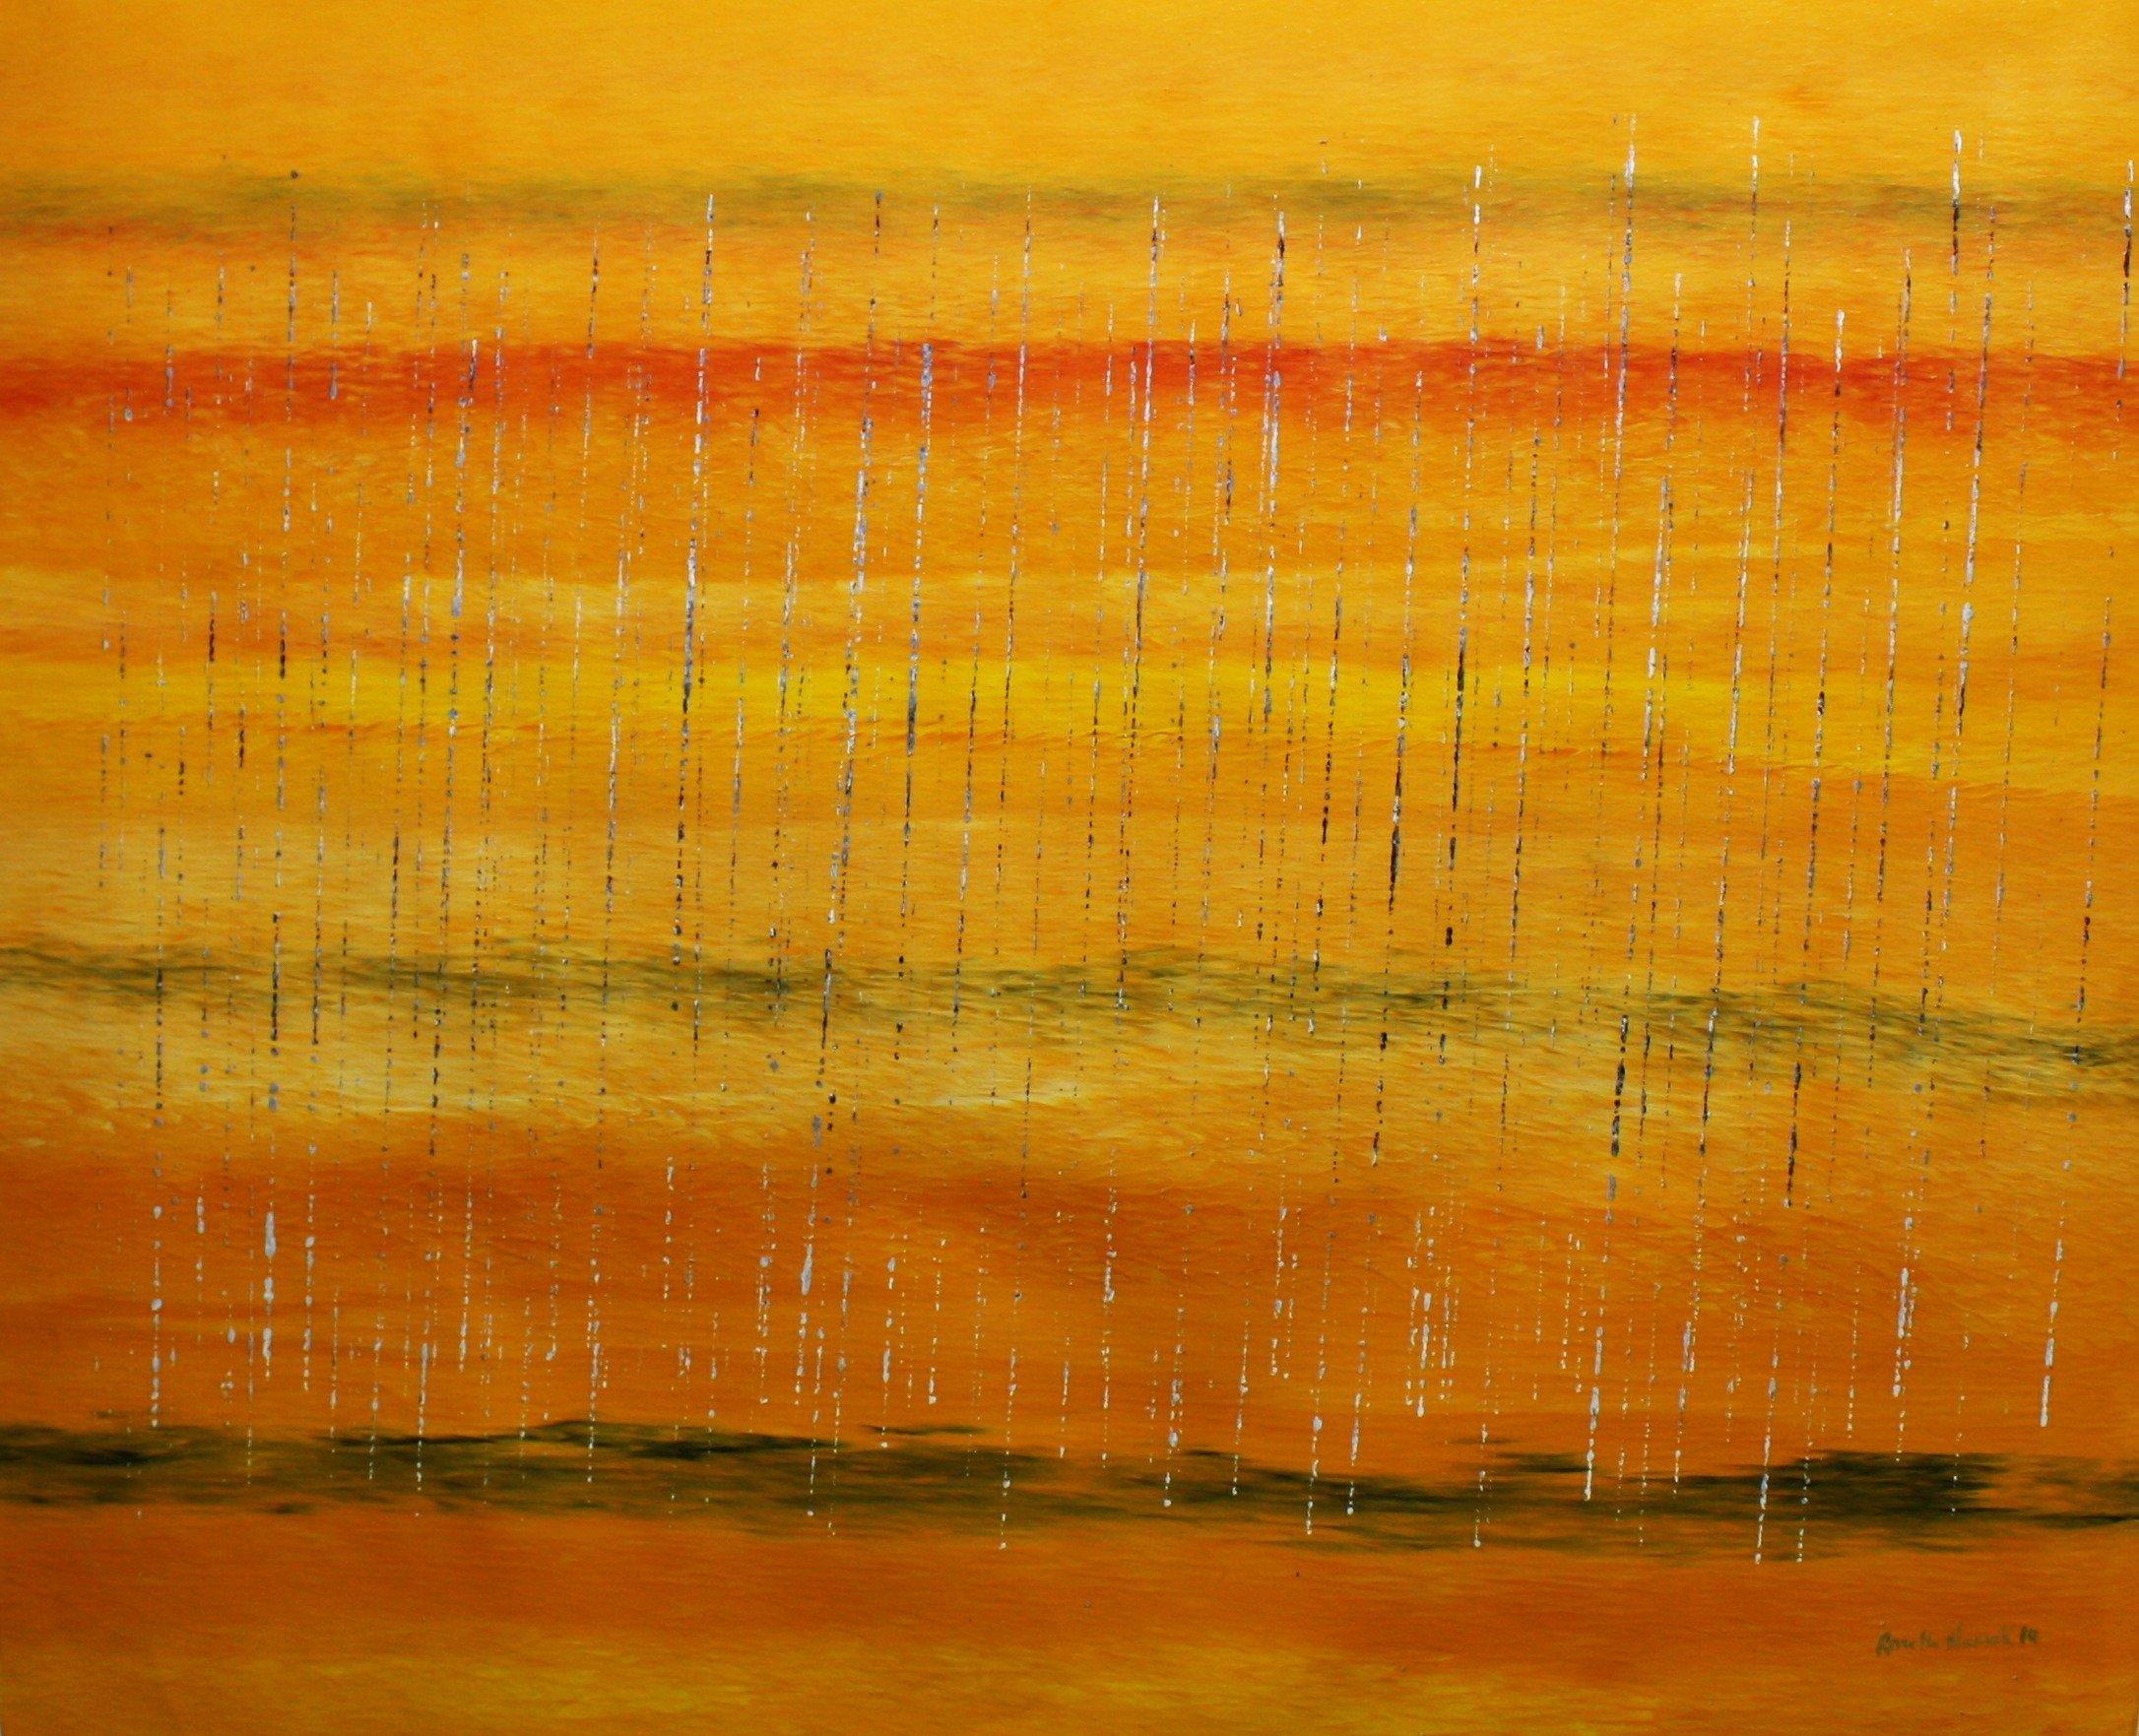 Stinging rain … Yah fall down